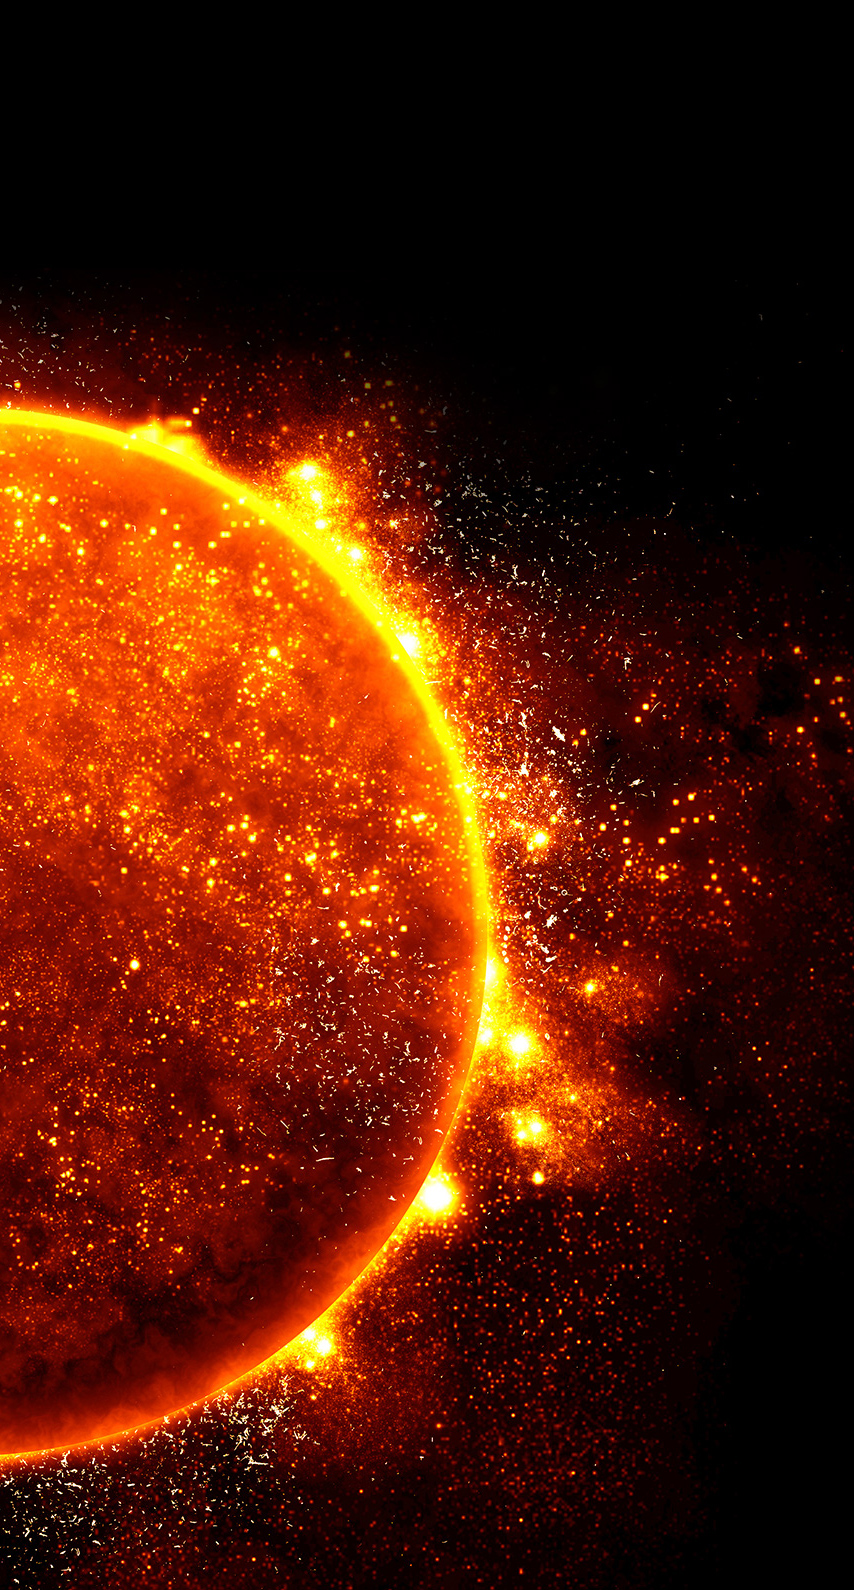 ball-shaped, exploration, solar, natural gas, explosion, plasma